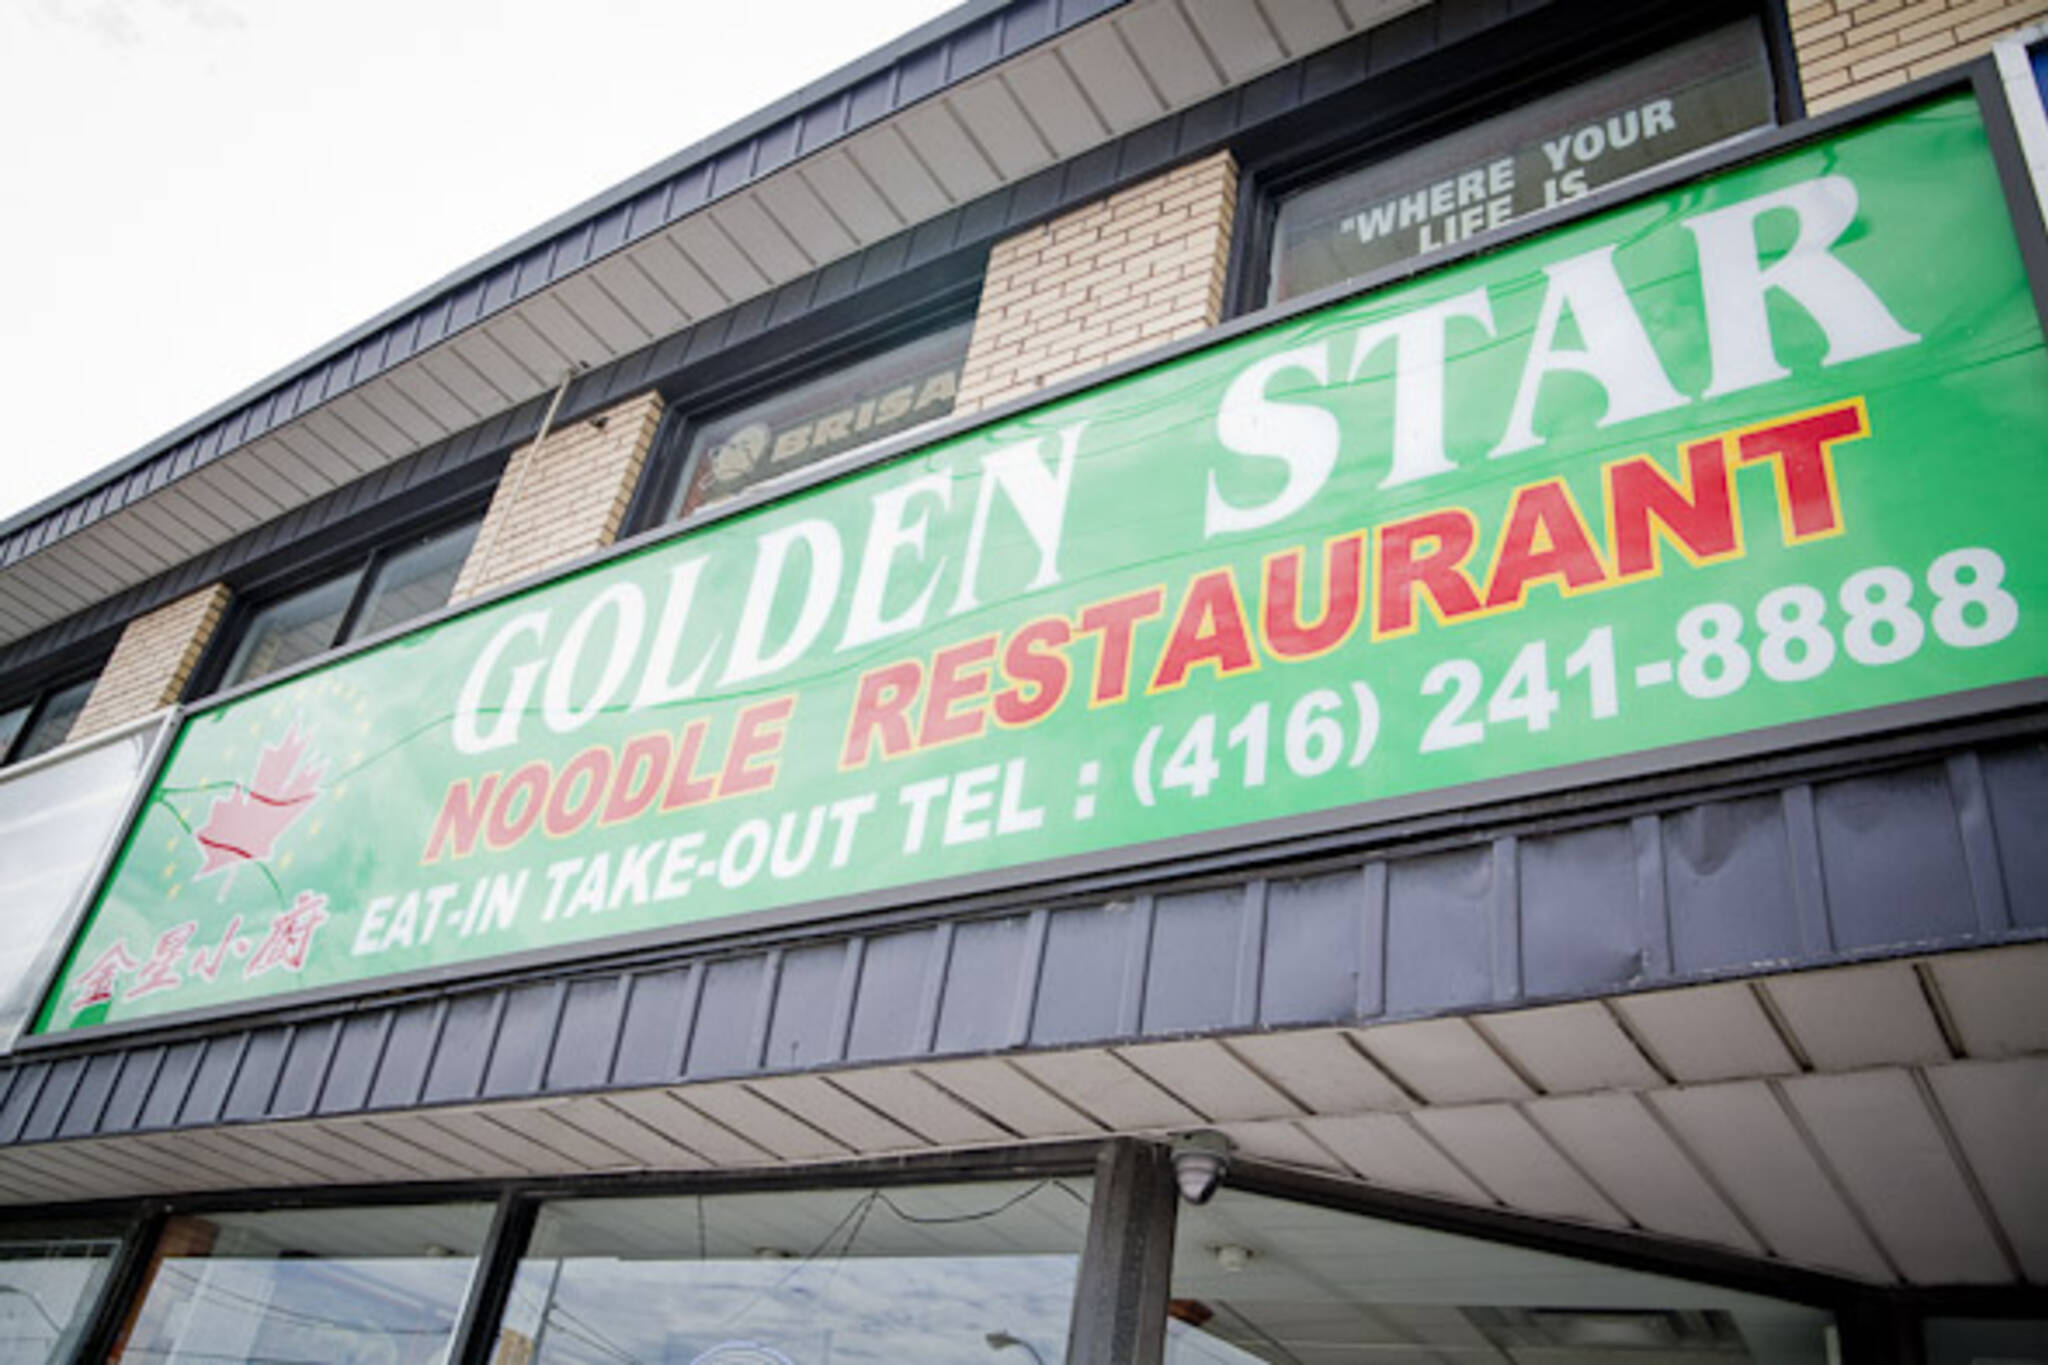 Golden Star Toronto